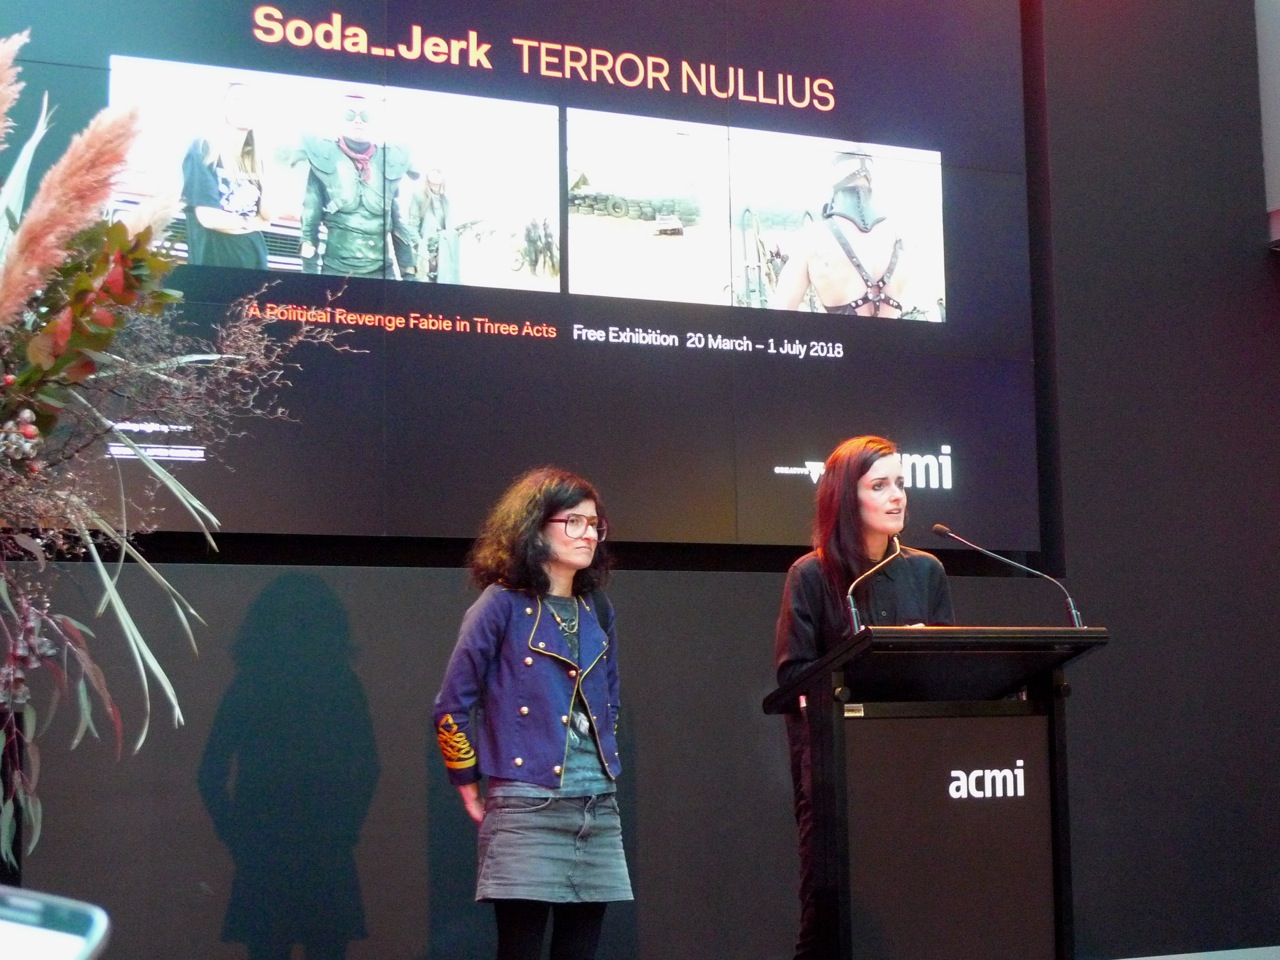 SODA_JERK speak